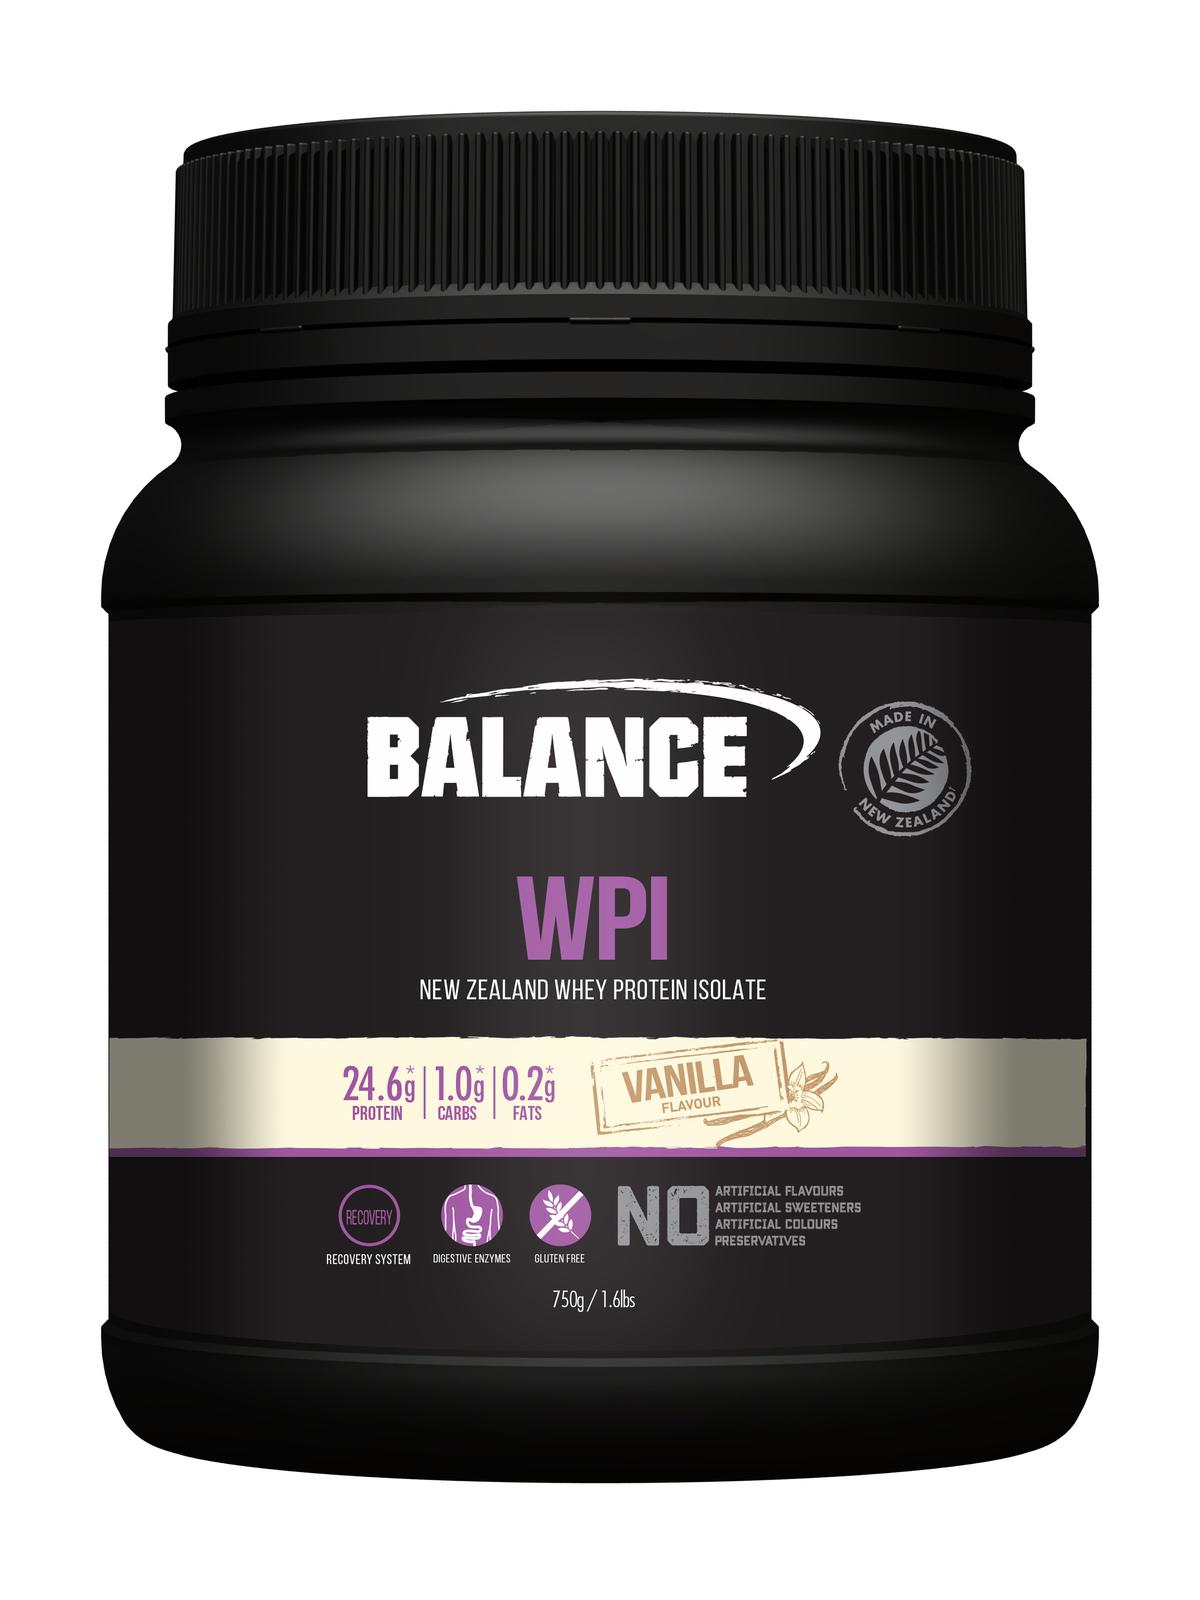 Balance WPI - Whey Protein Isolate Powder - Vanilla (750g) image